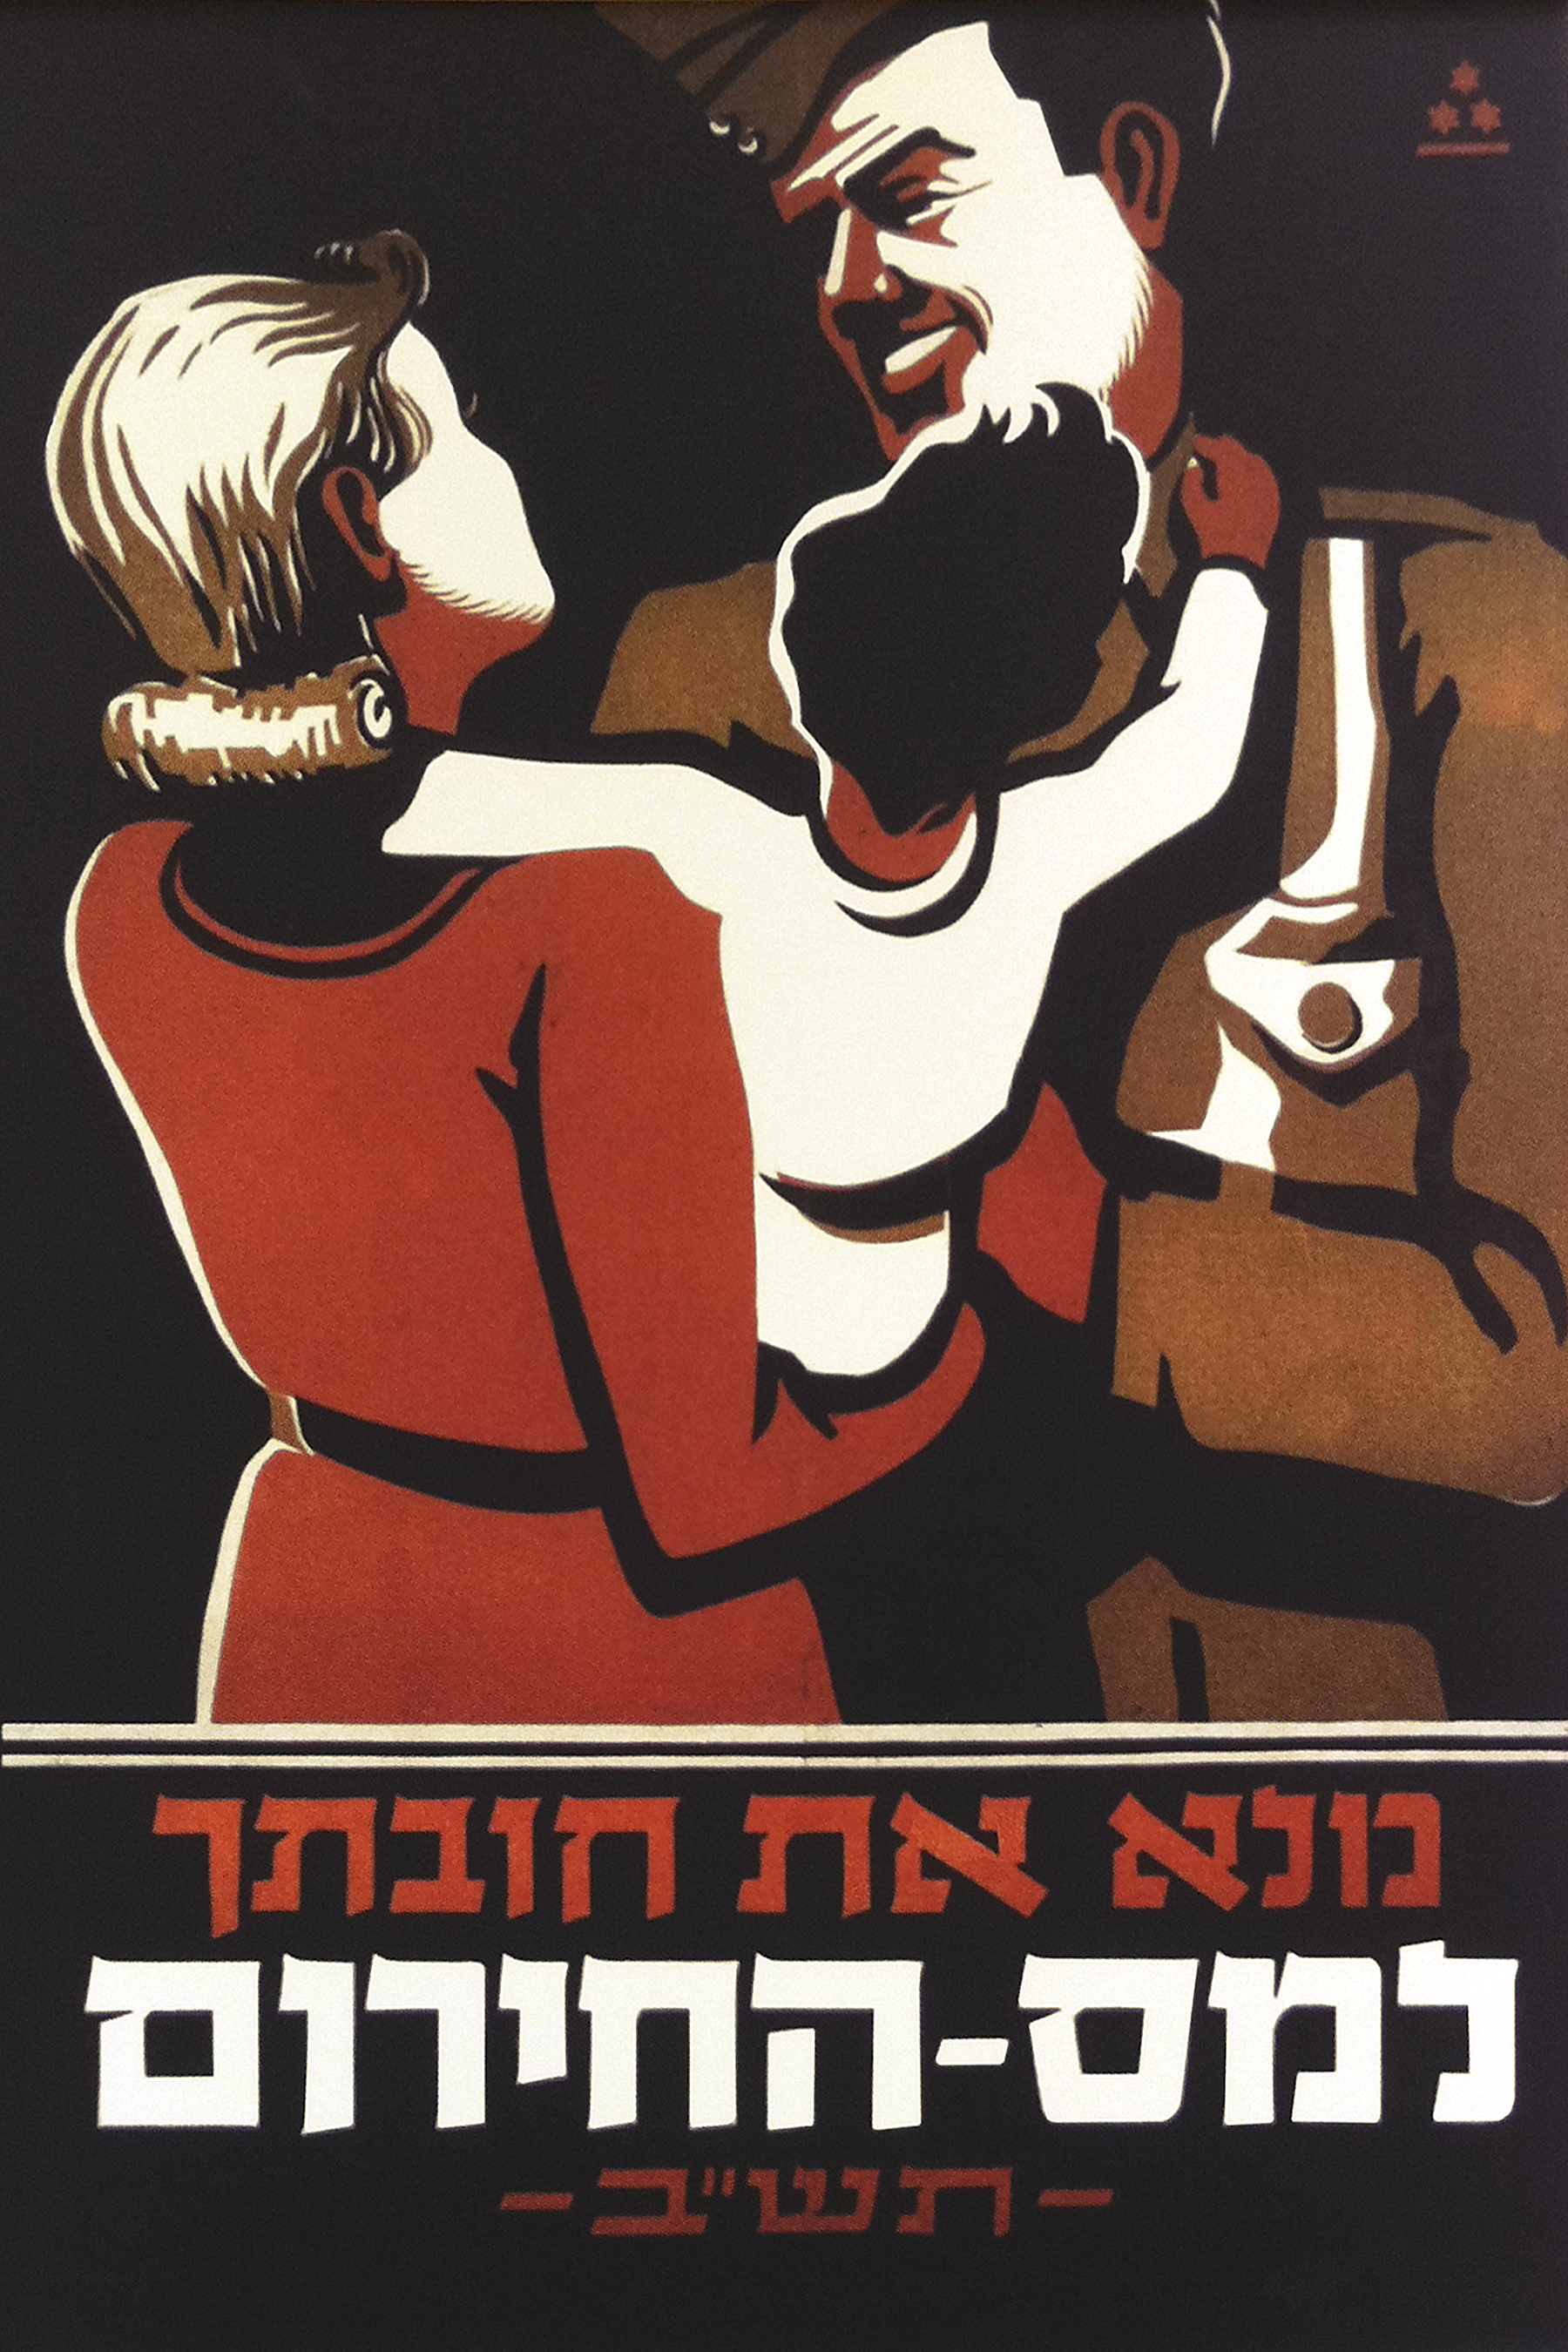 Httpwww Overlordsofchaos Comhtmlorigin Of The Word Jew Html: Haute Vitrine